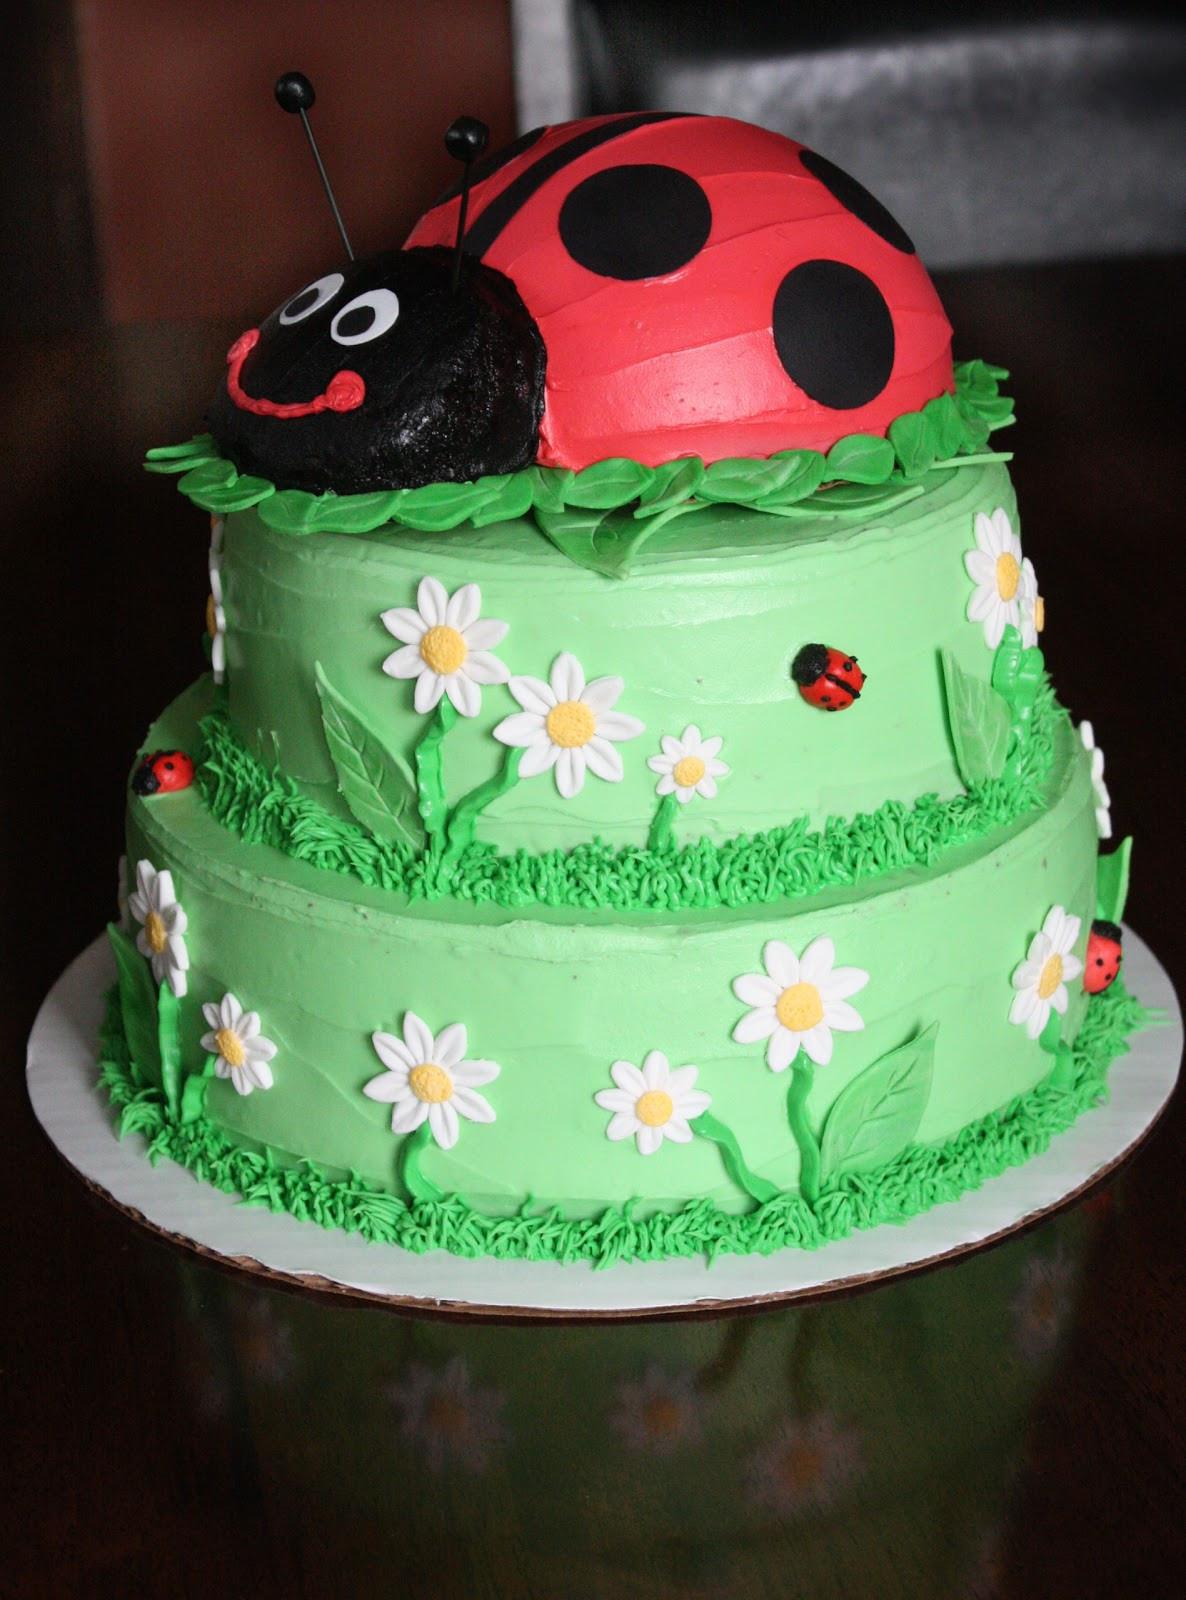 Best ideas about Ladybug Birthday Cake . Save or Pin Straight to Cake Ladybug 1st Birthday Now.